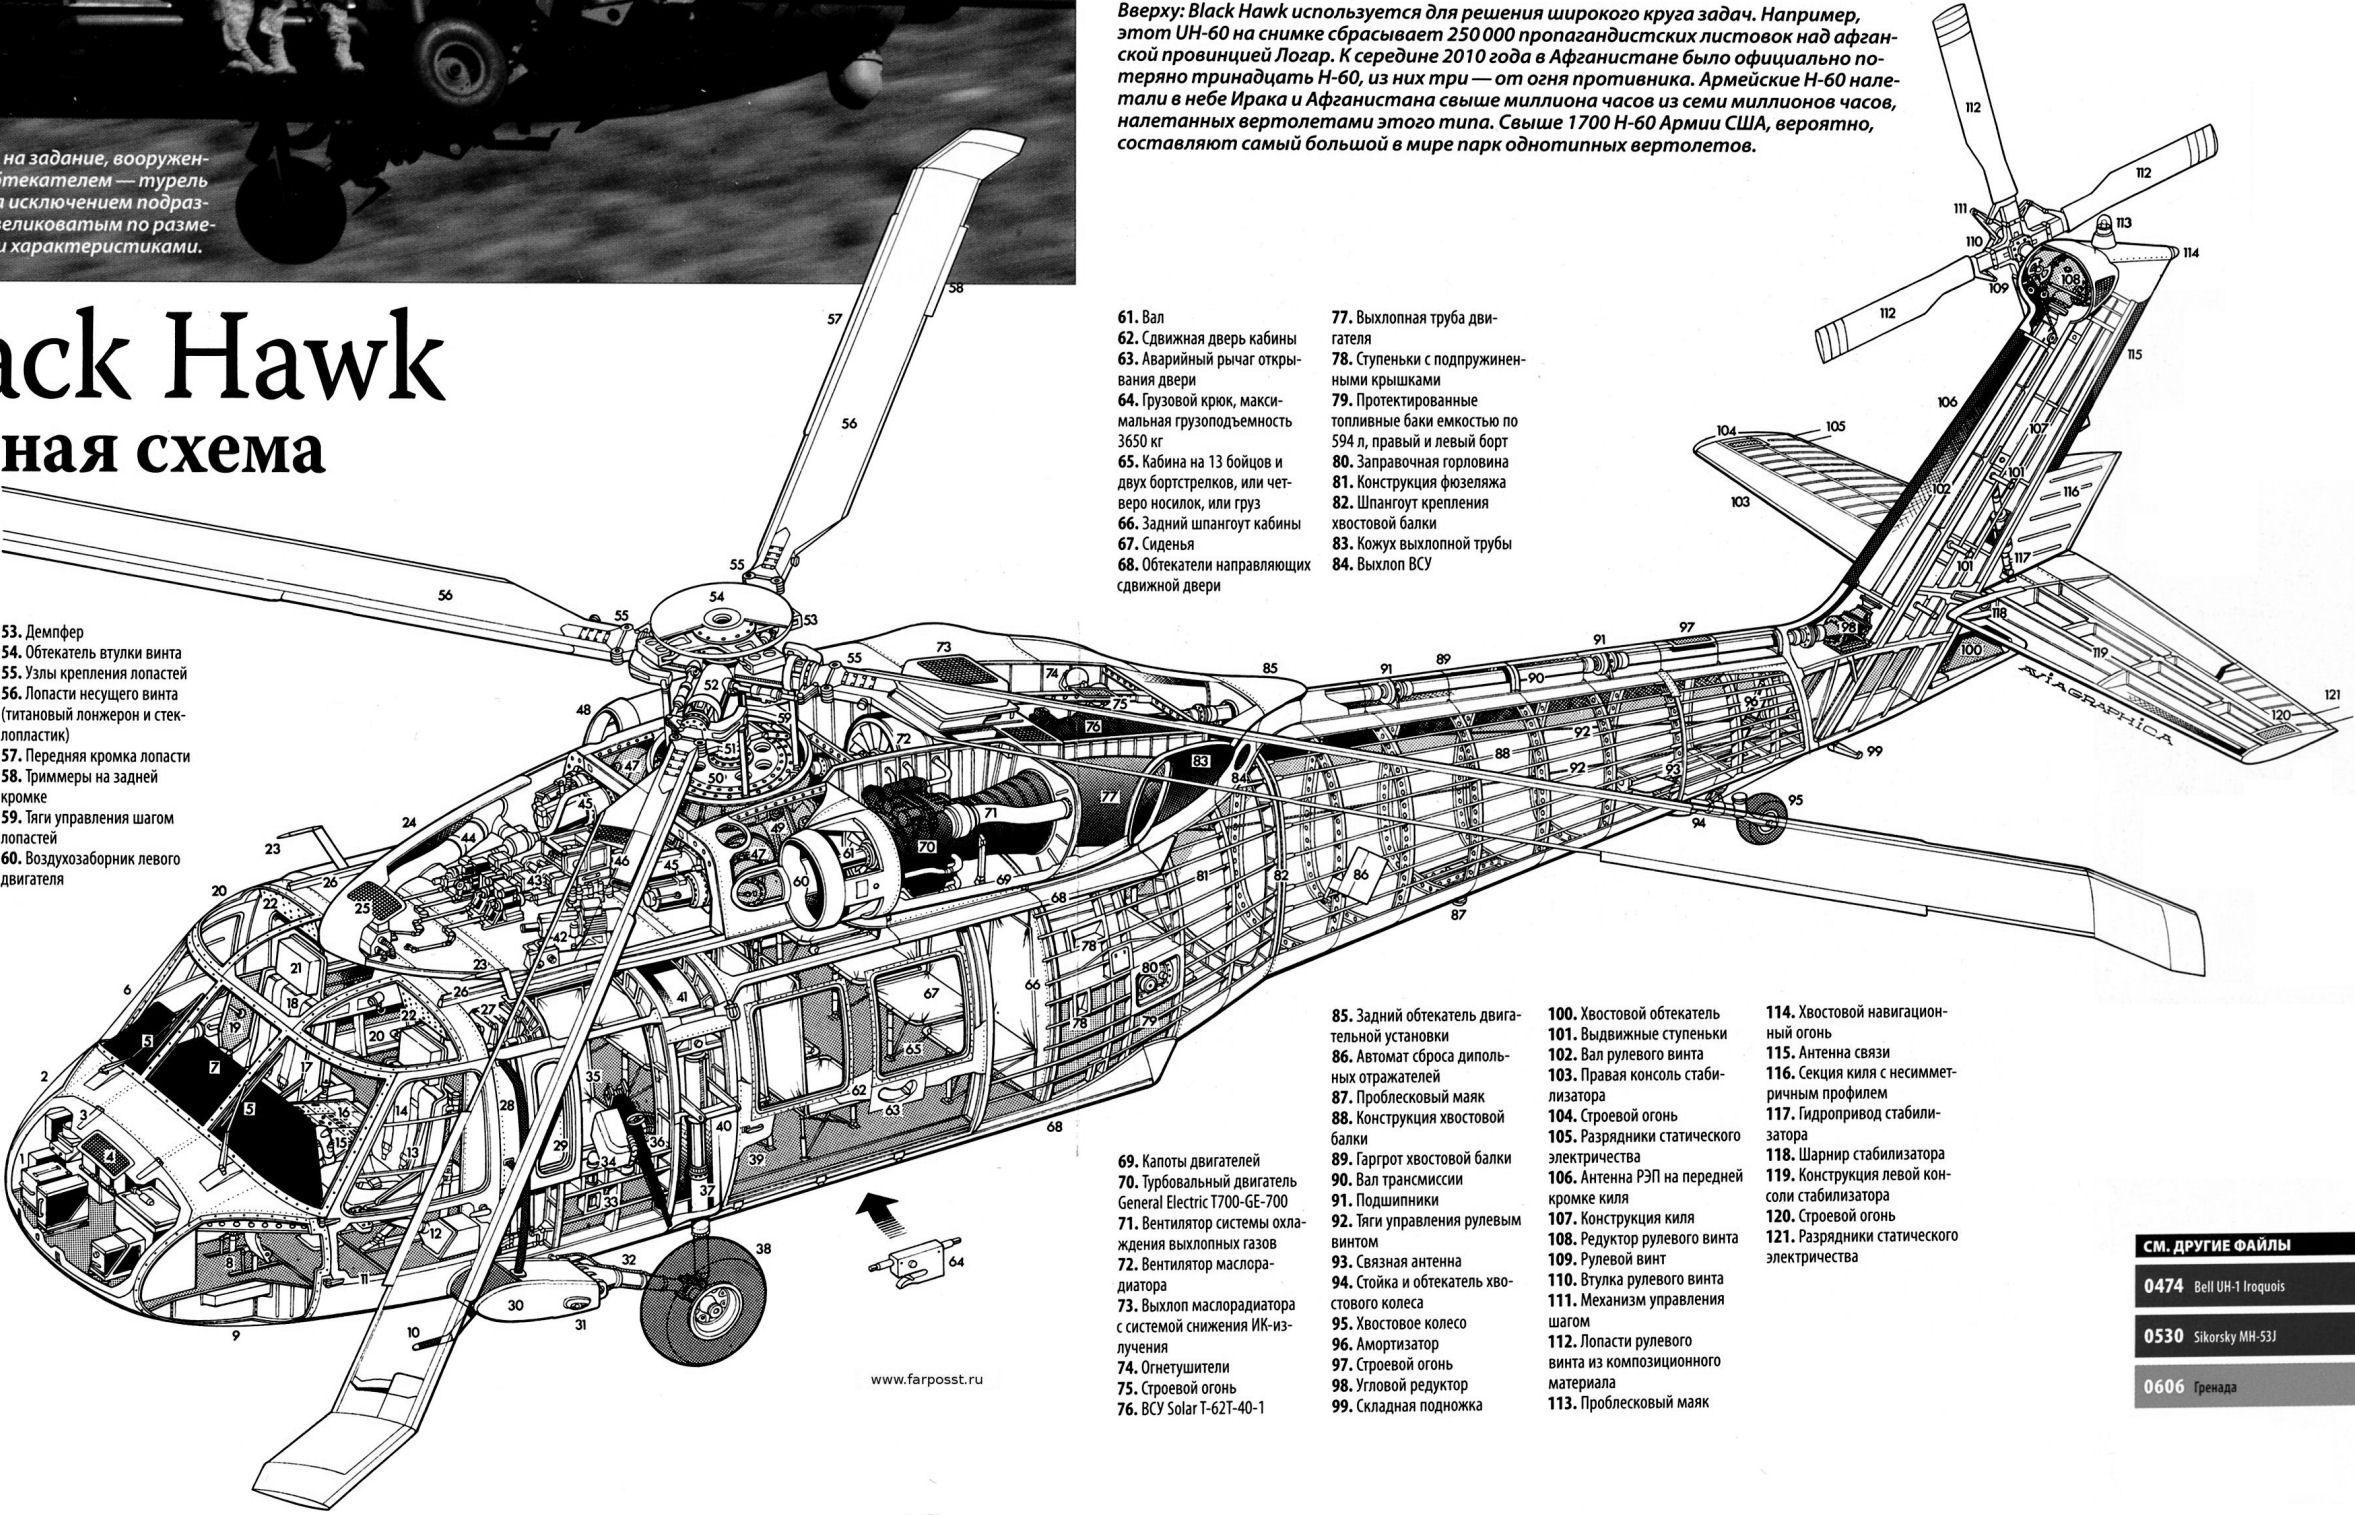 Desert Hawk Diagram Telephone Jack Wiring Aircarft Cutaway Cutaways Pinterest